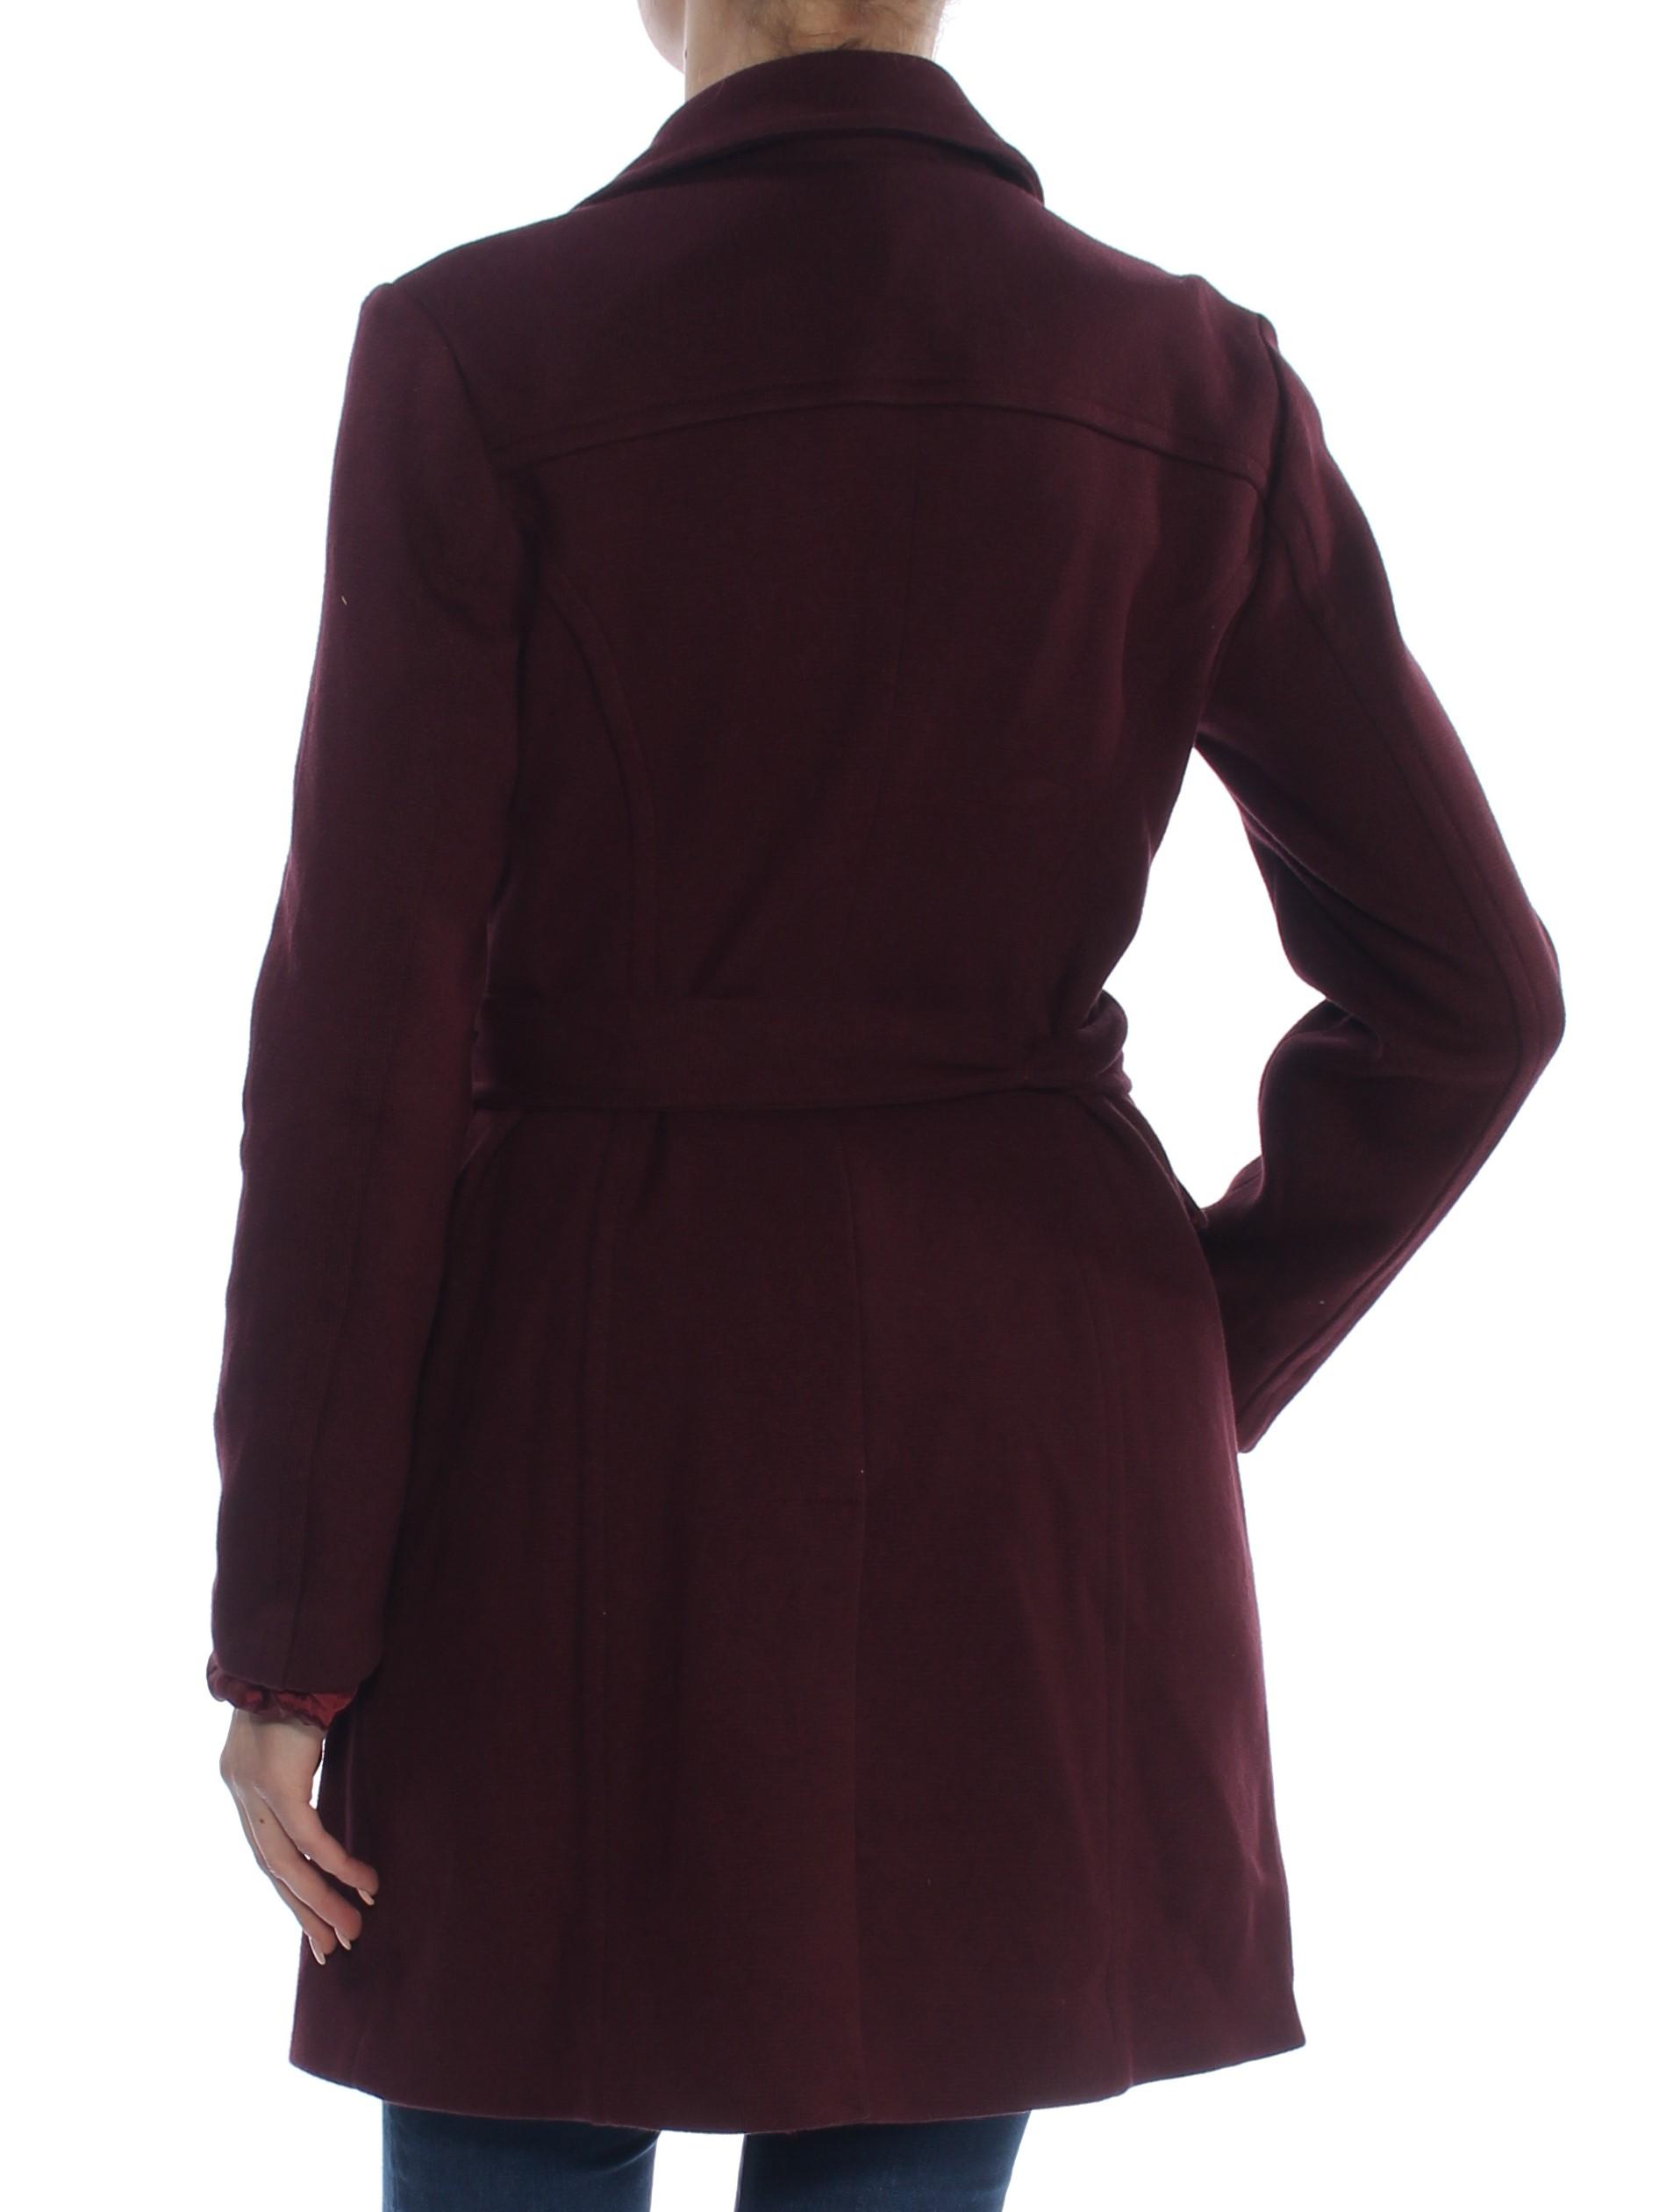 fe8ebc827d5cf INC  149 Womens New 1272 Burgundy Peacoat Casual Jacket M Plus B+B. gallery  image gallery image. INC GUARANTEED AUTHENTIC!